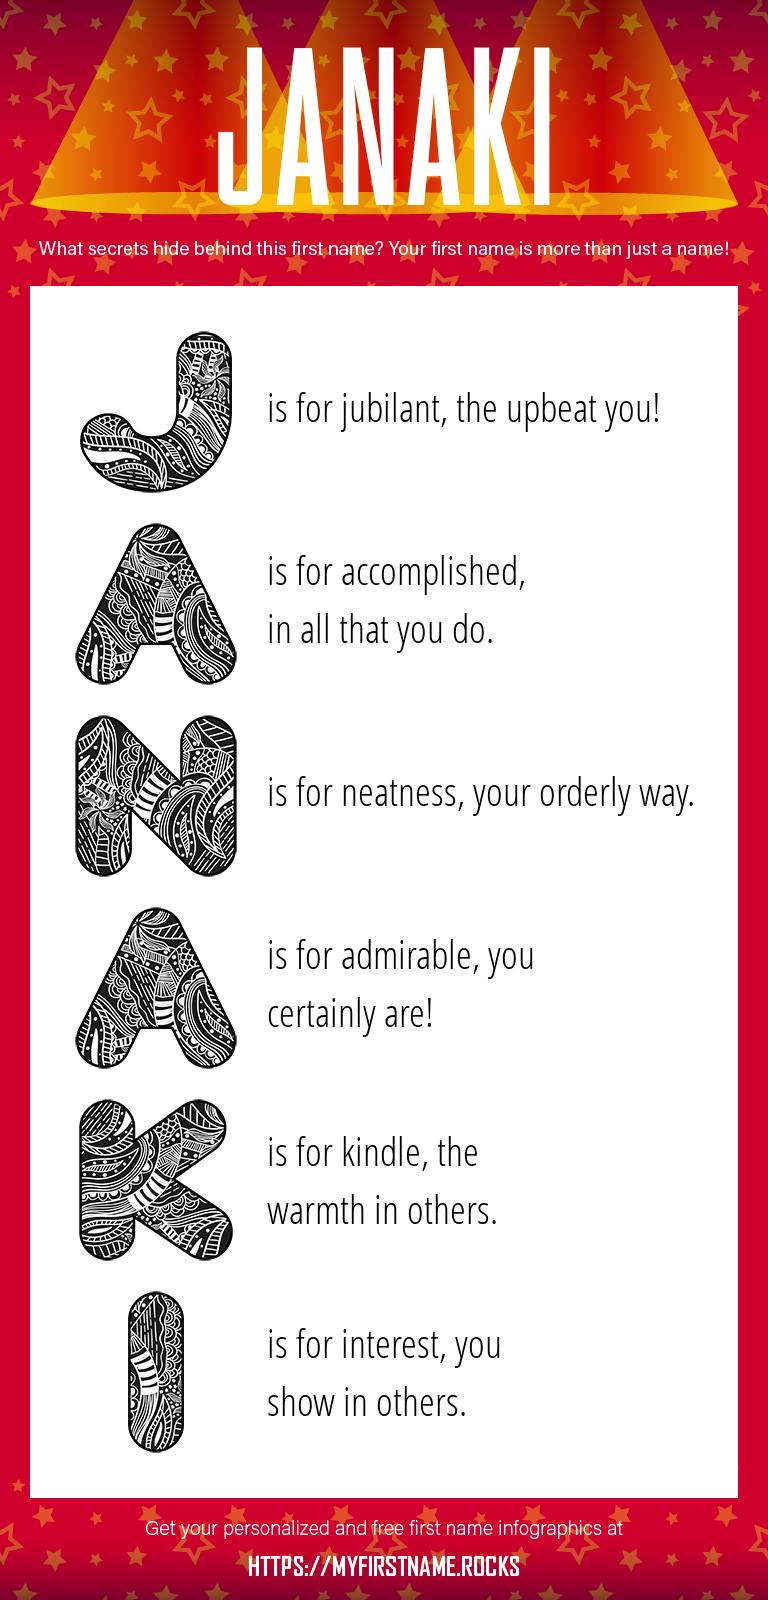 Janaki Infographics